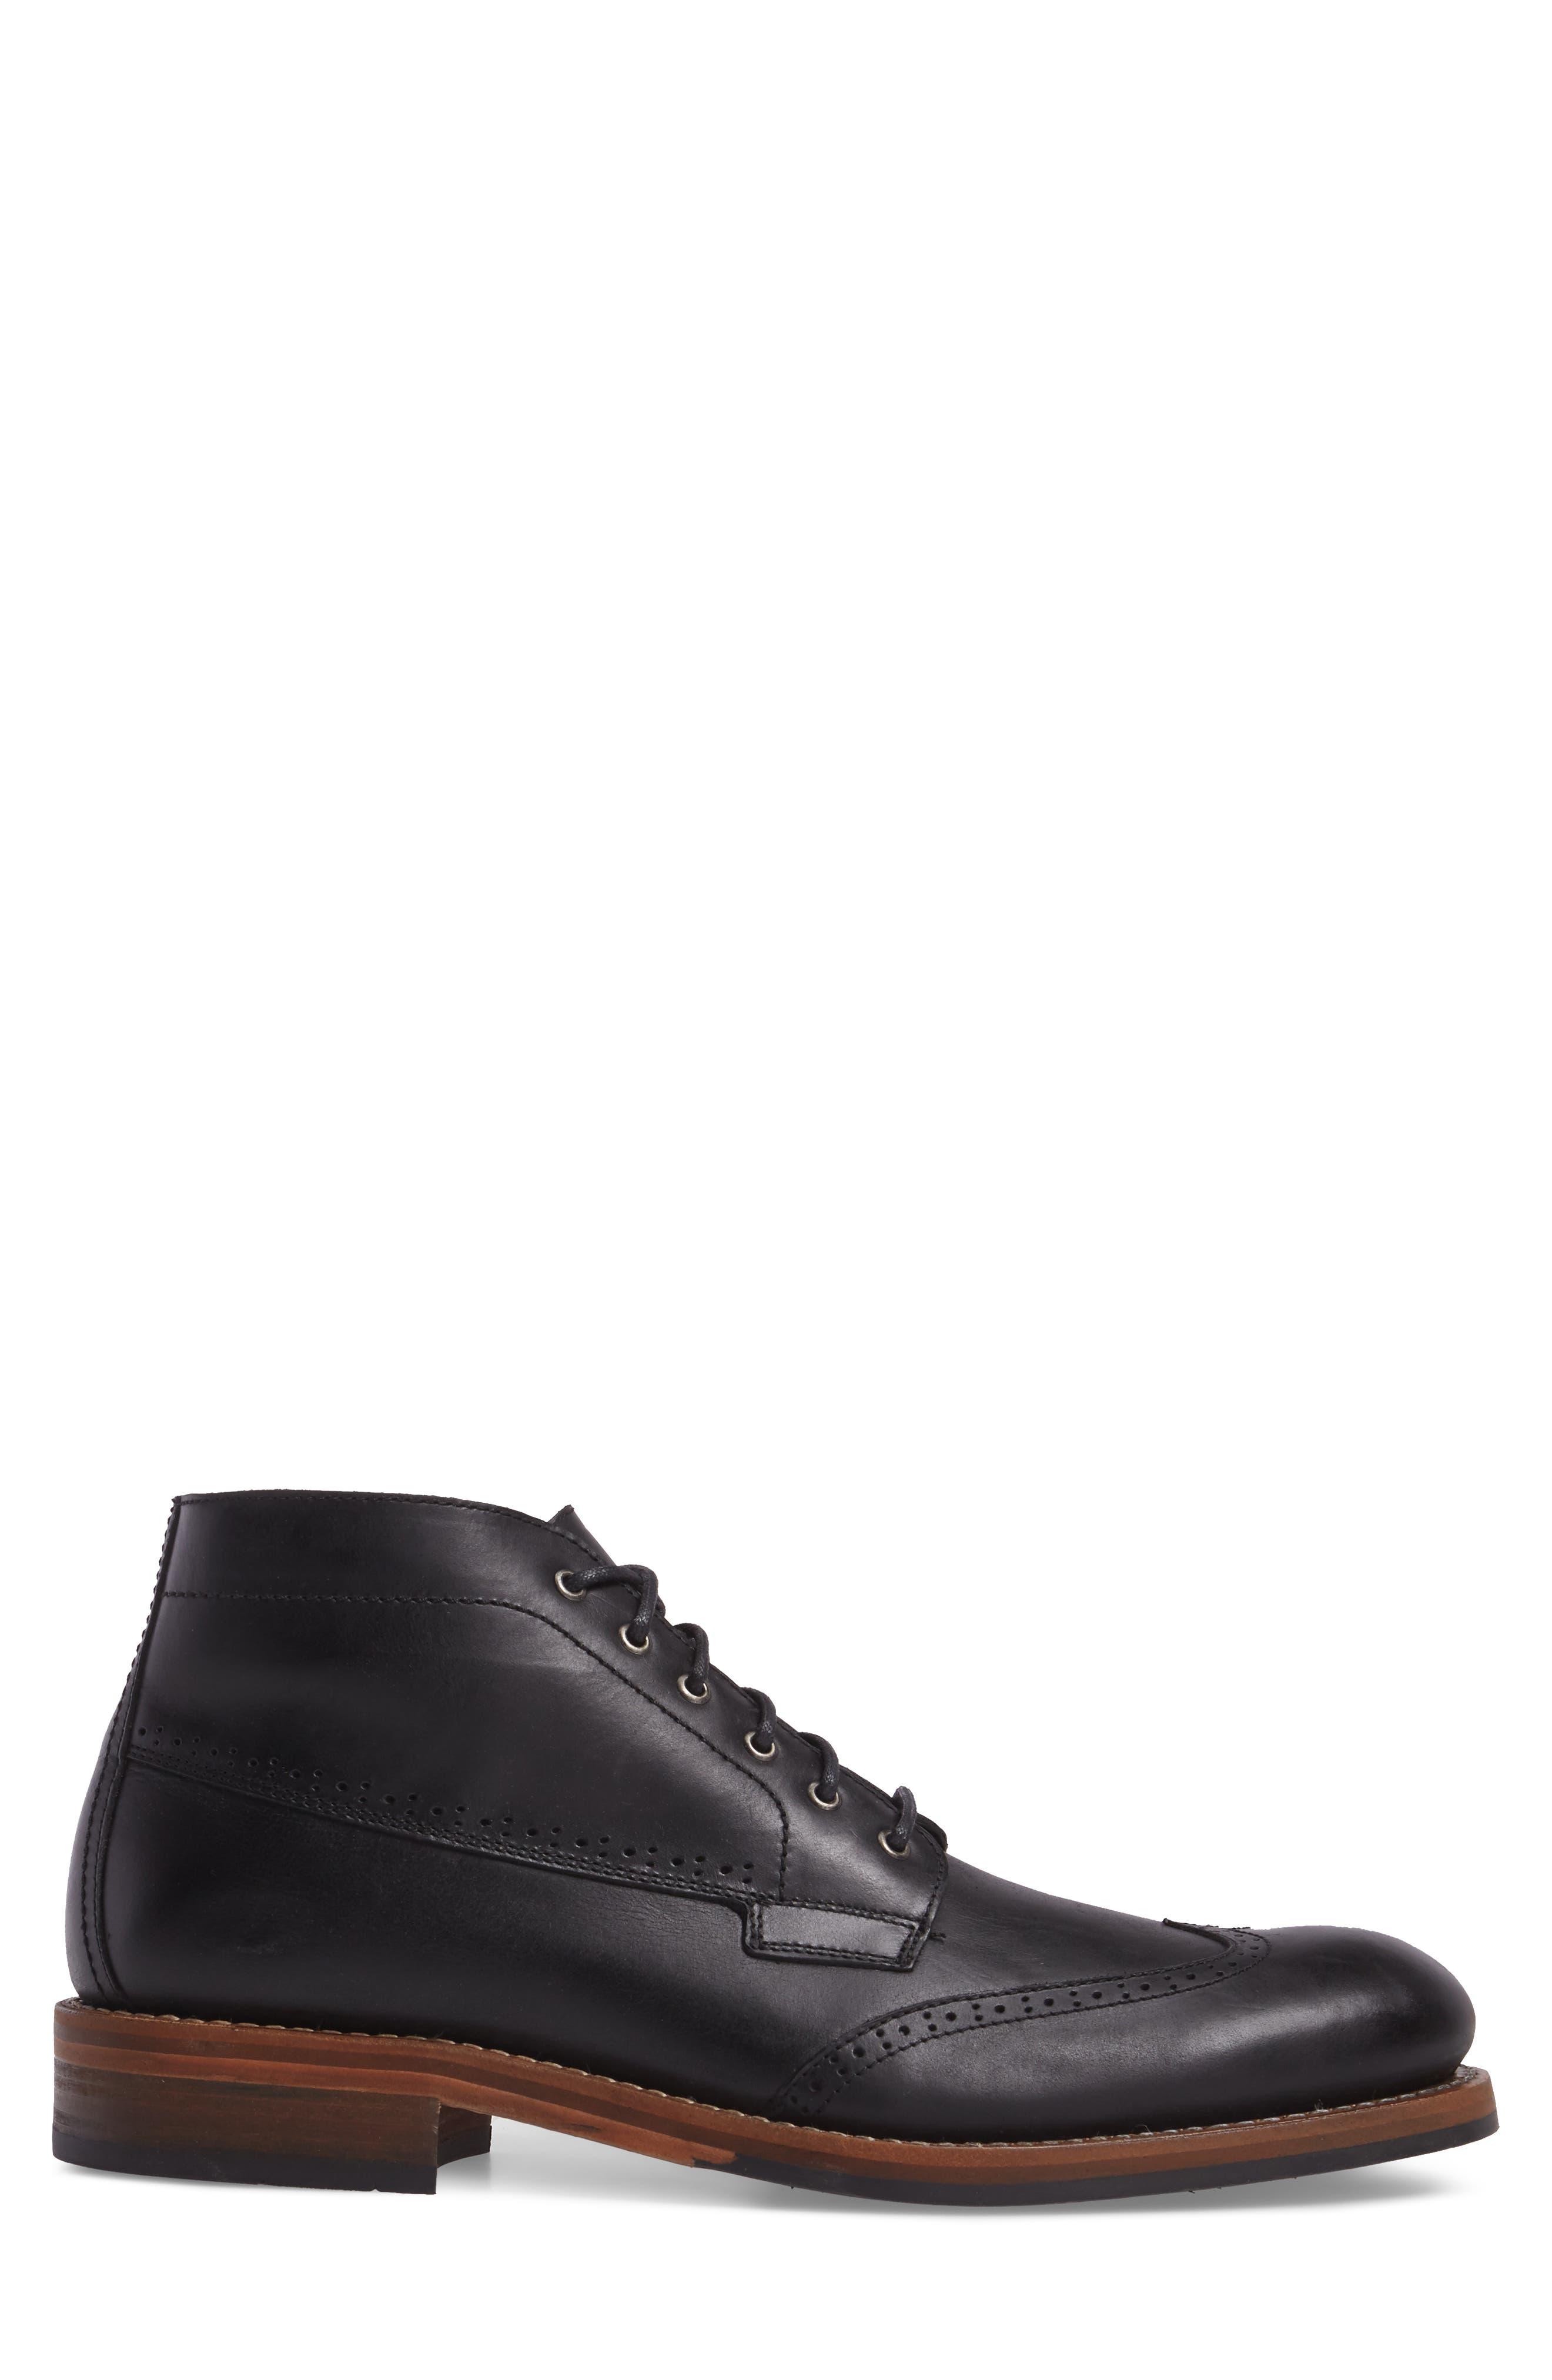 Harwell Wingtip Boot,                             Alternate thumbnail 3, color,                             Black